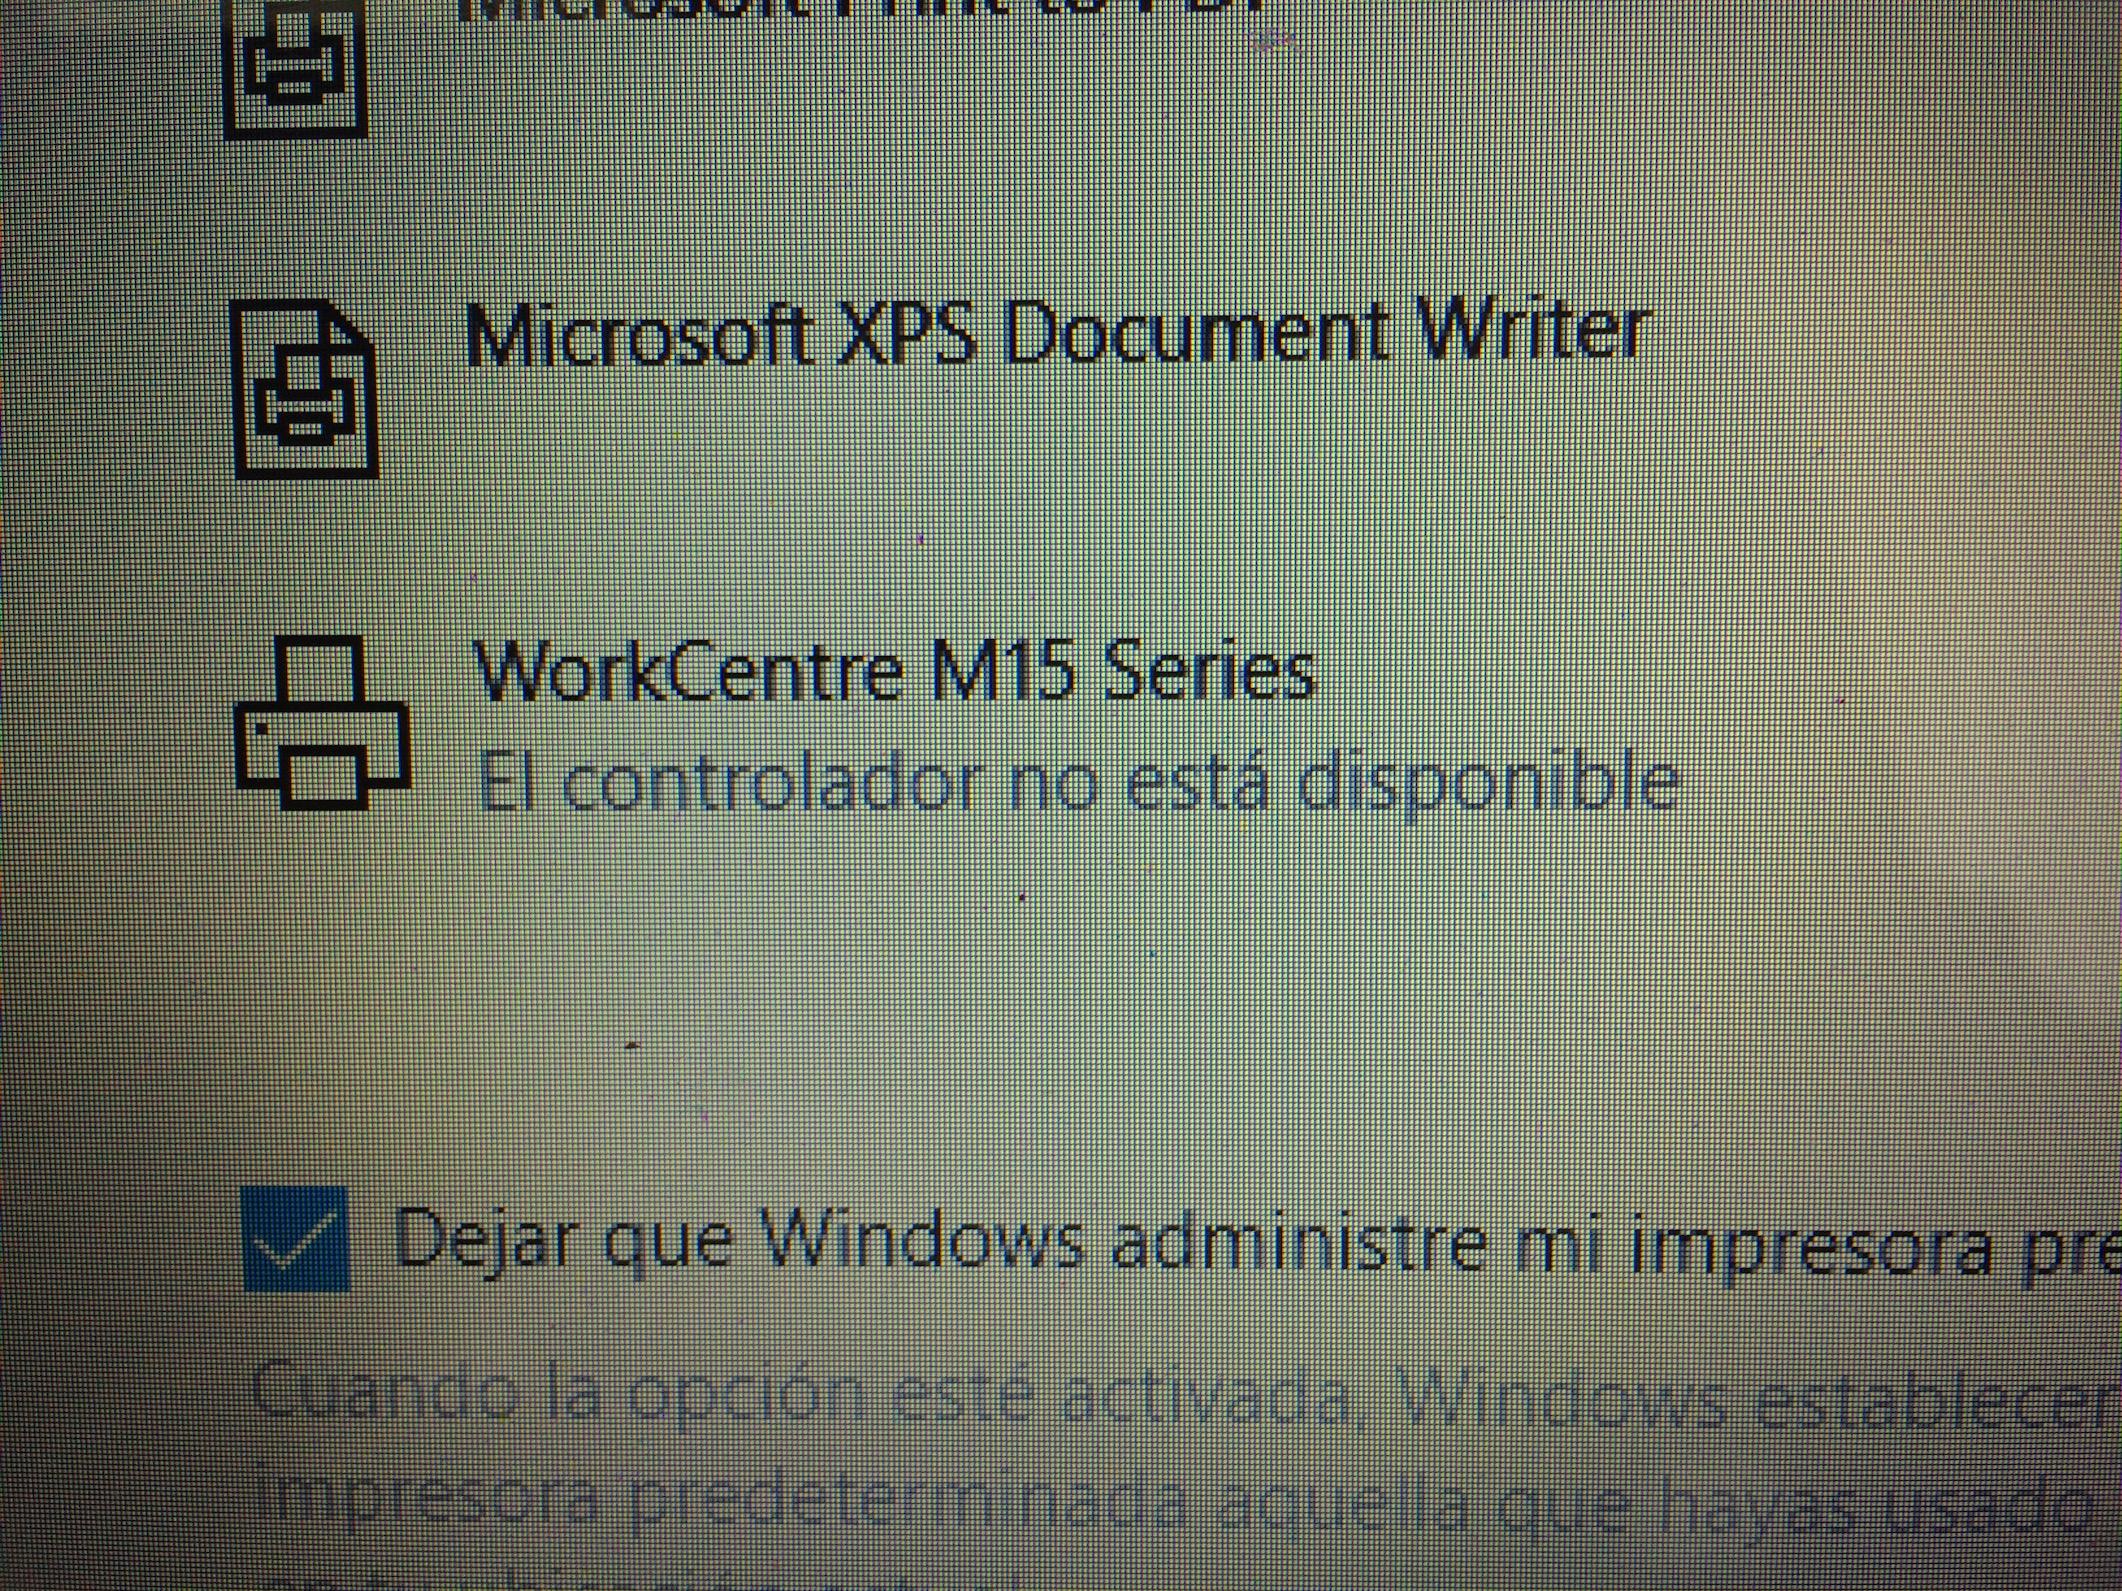 WorkCentre M15